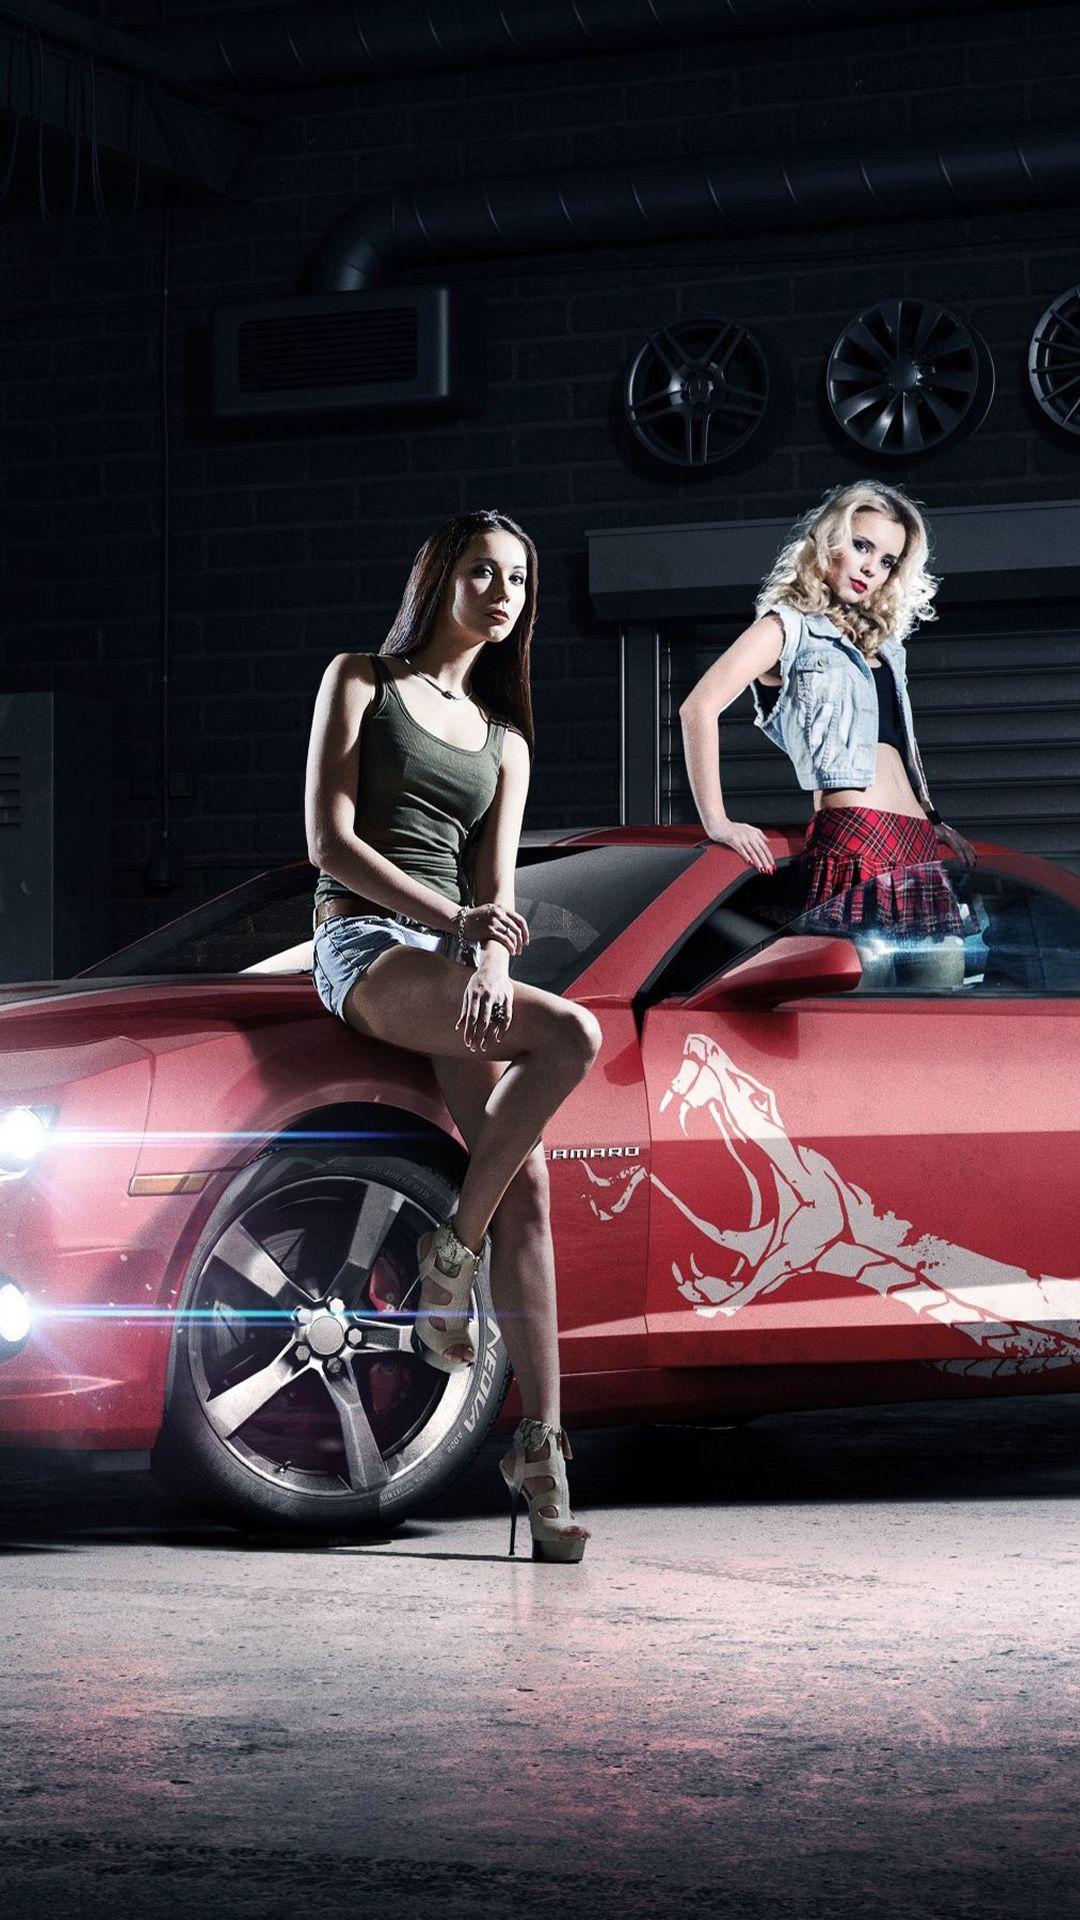 World Of Speed Iphone 7 Wallpaper Car Girls Girl Fashion Car Girl